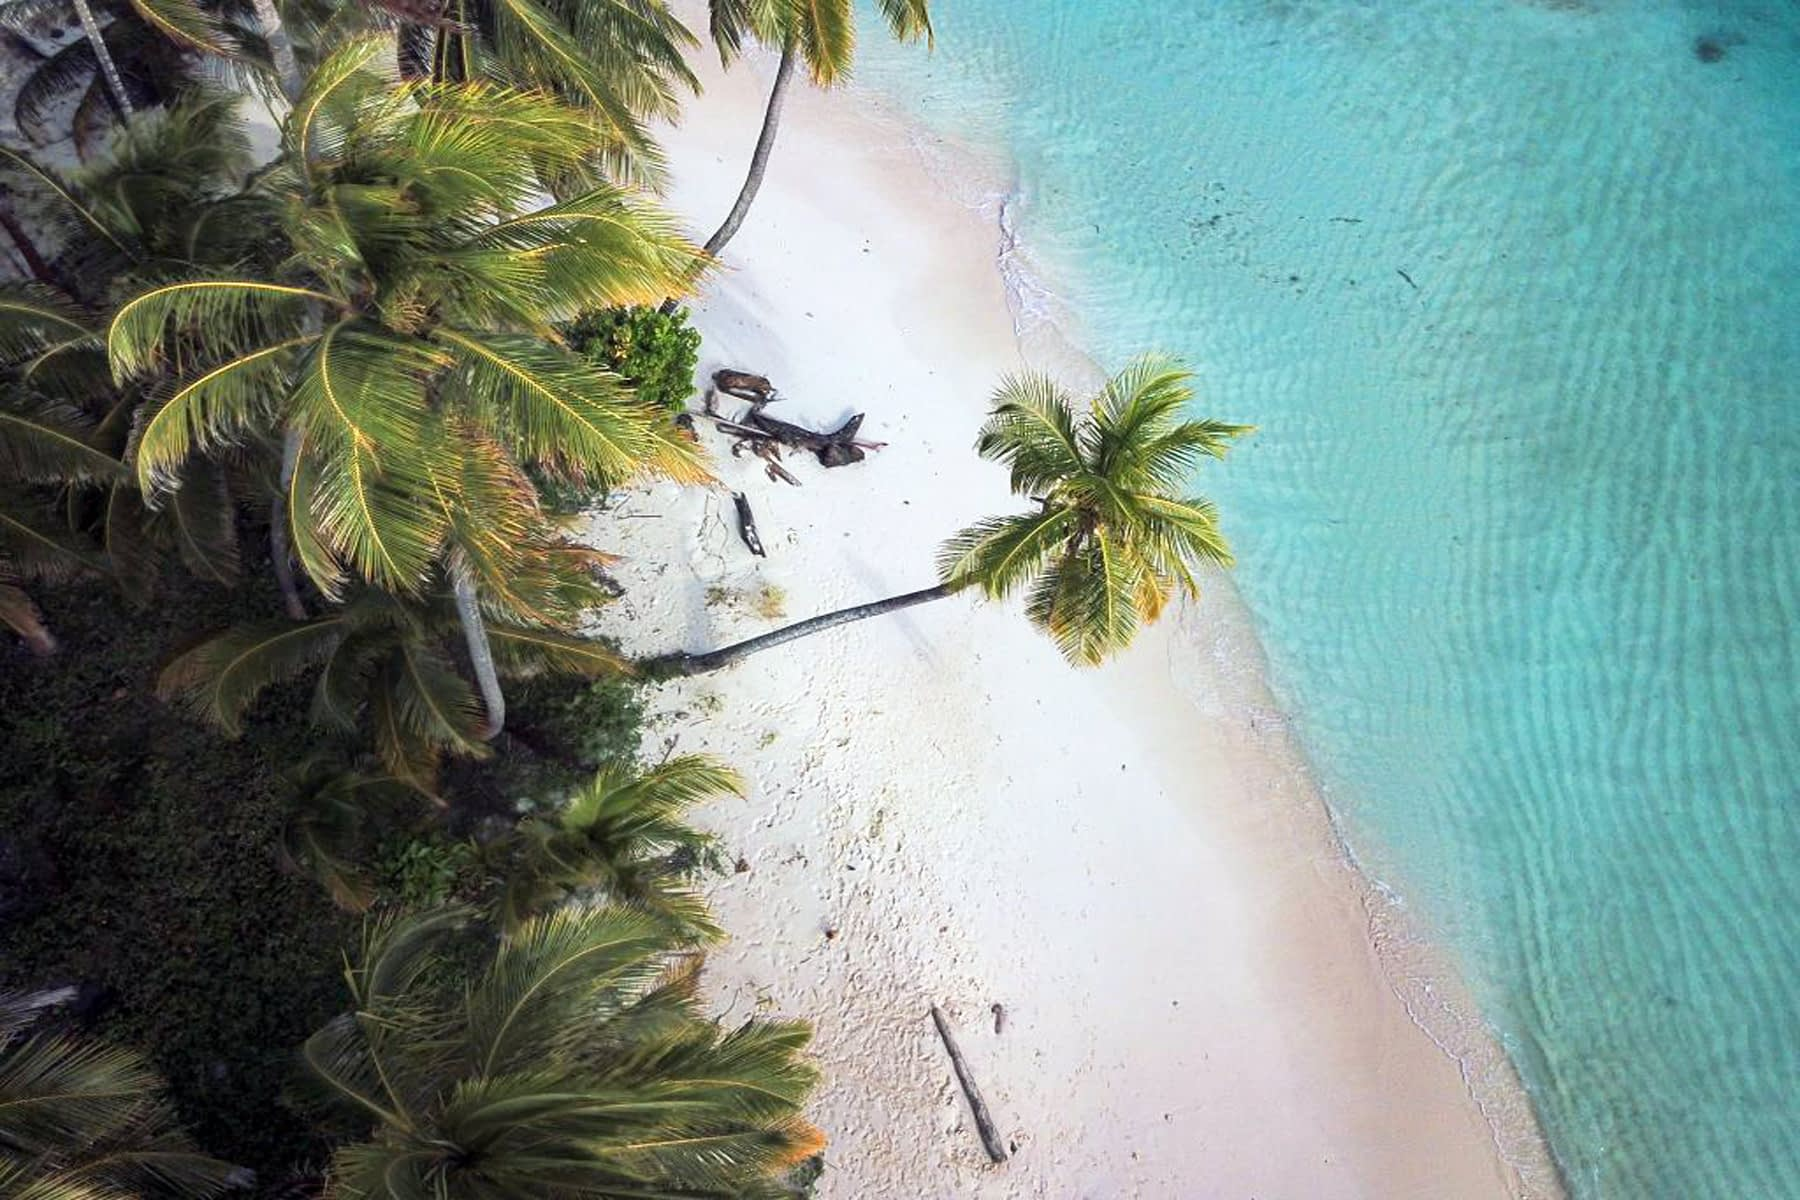 Vista aérea de la isla en Gaimaudubgan